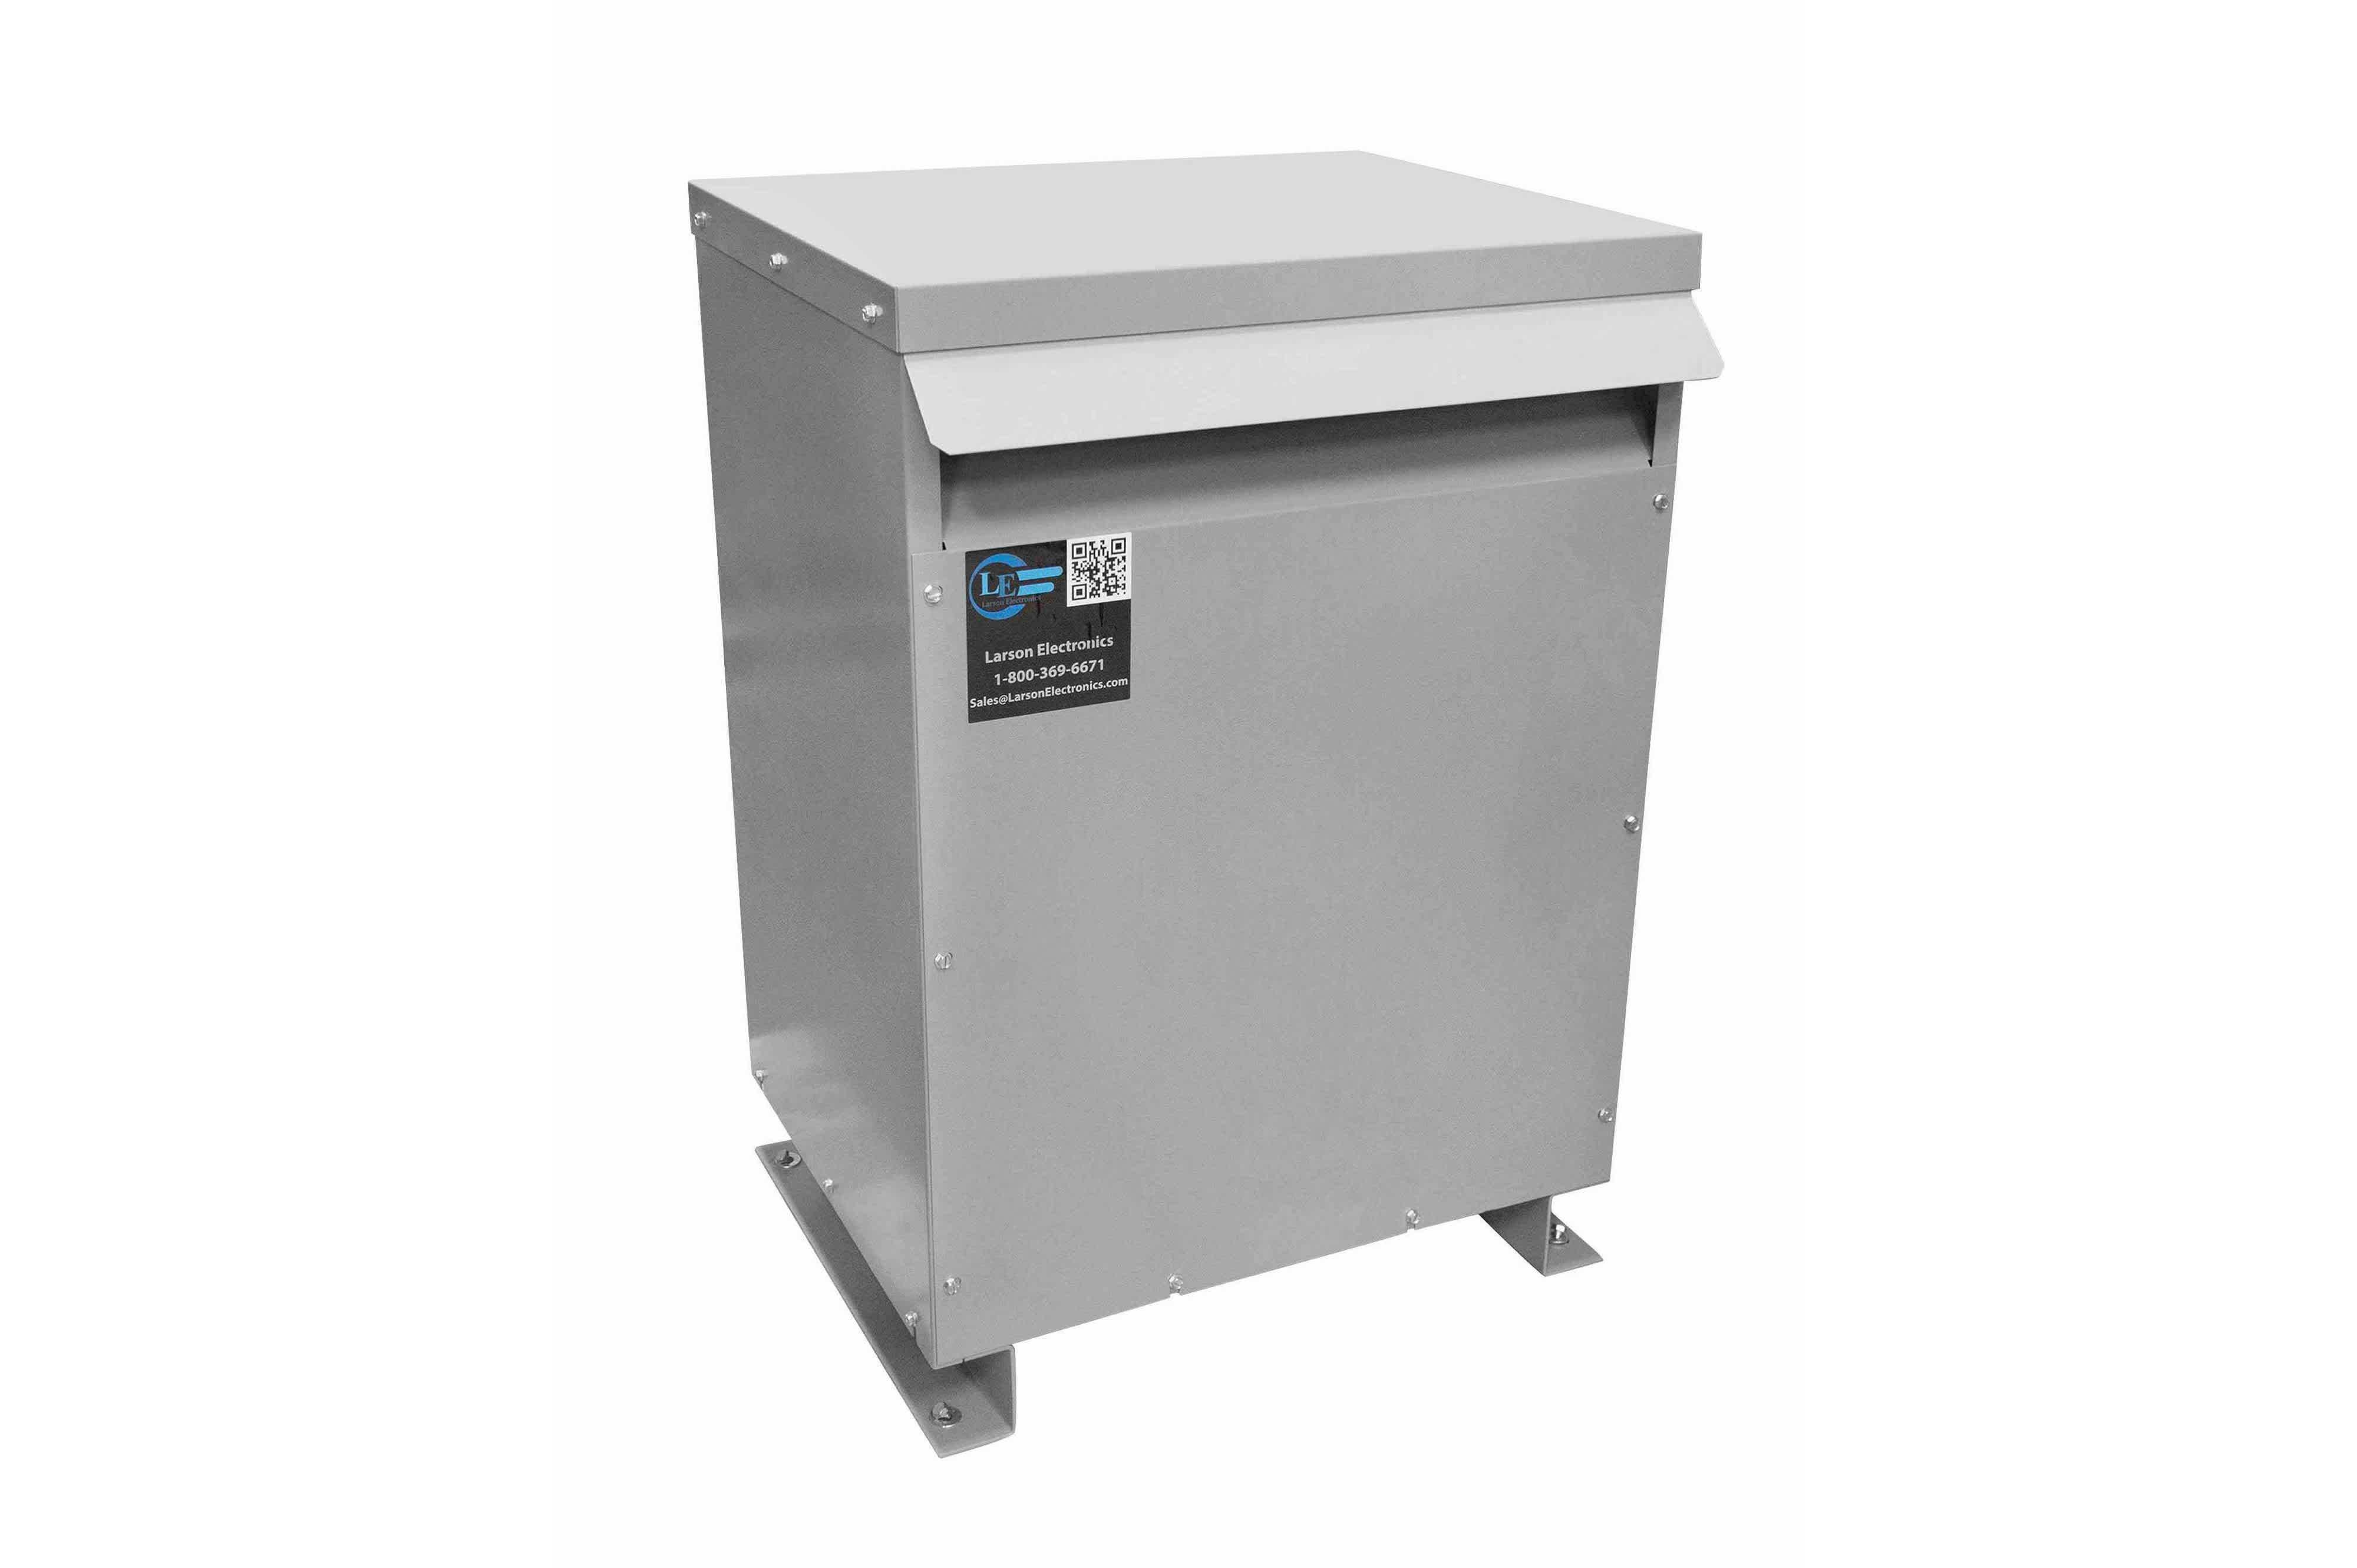 125 kVA 3PH Isolation Transformer, 380V Wye Primary, 600Y/347 Wye-N Secondary, N3R, Ventilated, 60 Hz